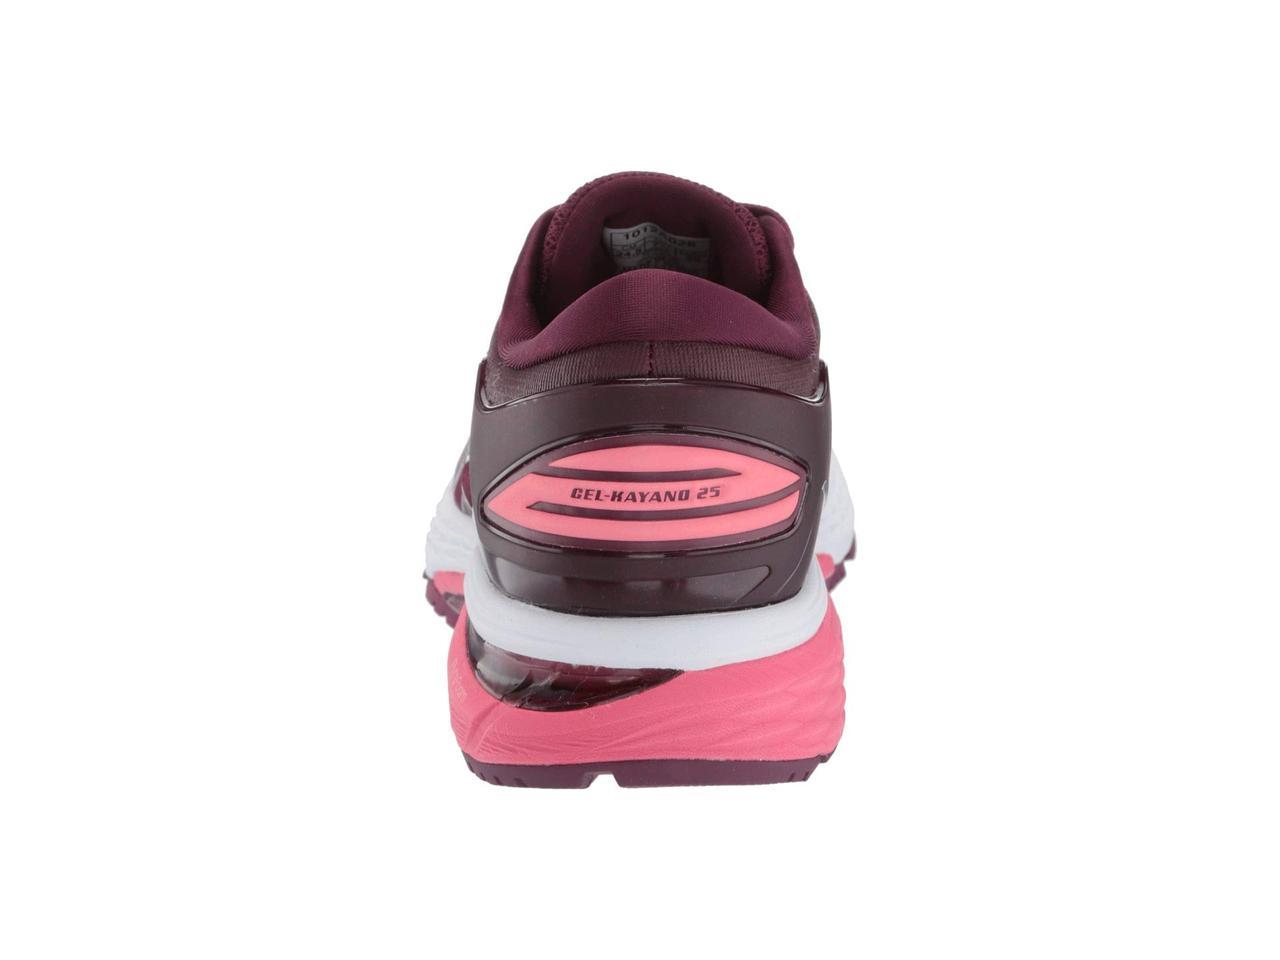 44e3f01a225e2 ... Кроссовки/Кеды (Оригинал) ASICS GEL-Kayano® 25 Roselle/Pink Camo ...